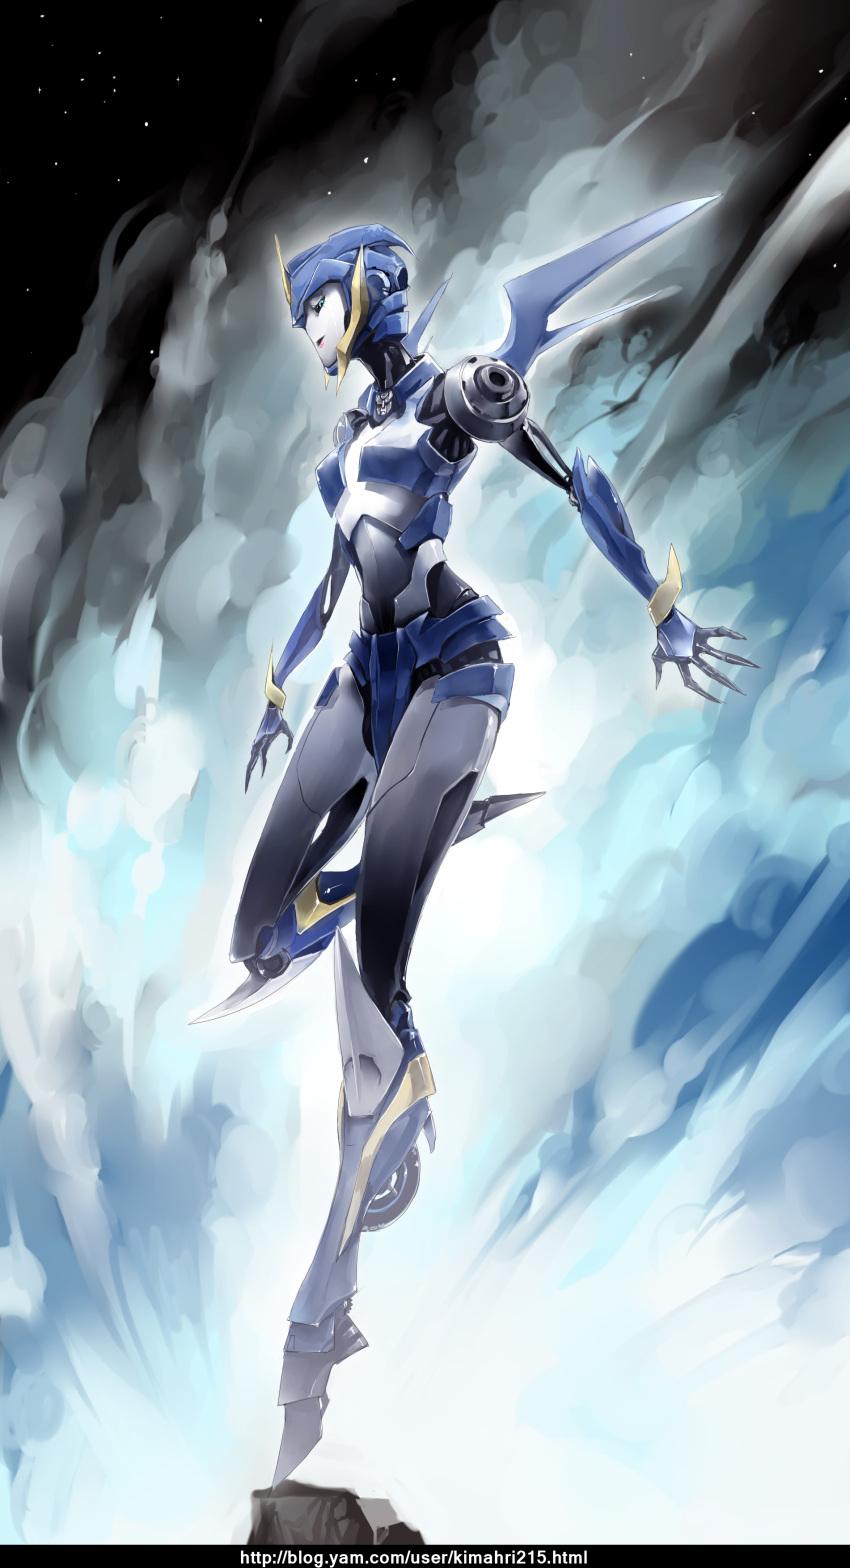 Arcee - Transformers - Mobile Wallpaper #1295371 ...